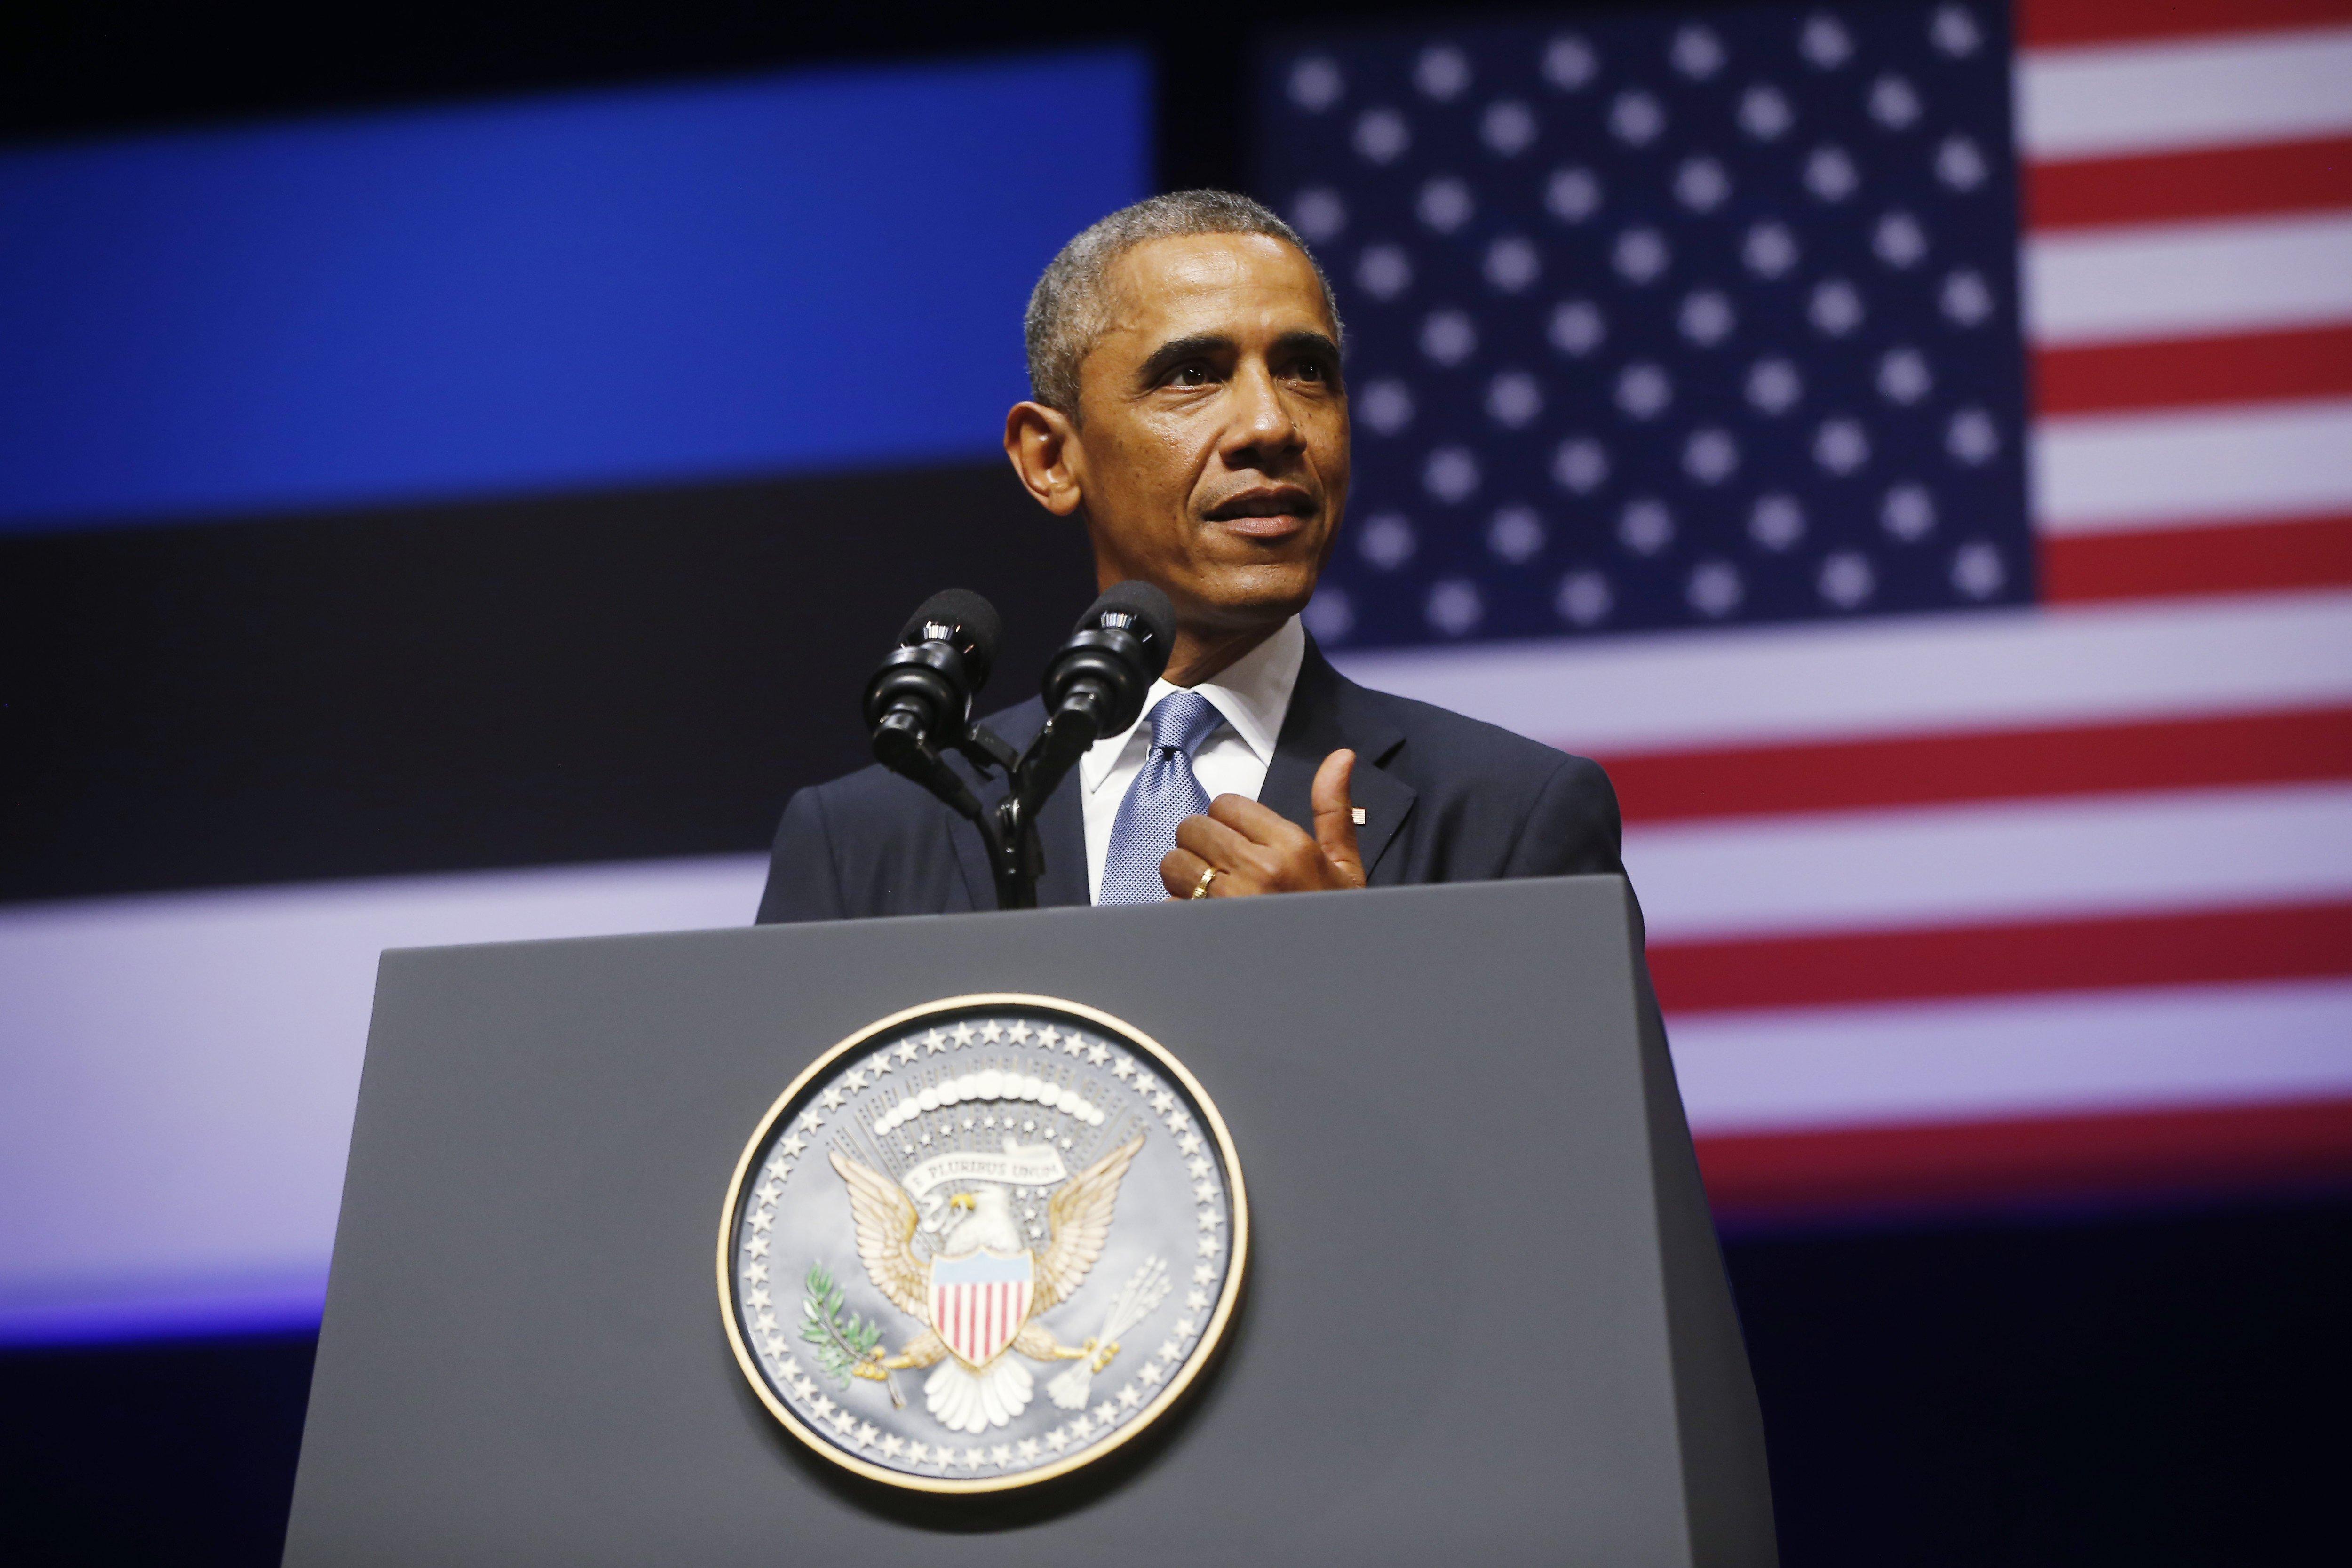 U.S. President Barack Obama speaks at Nordea Concert Hall in Tallinn, Estonia on Sept. 3, 2014.